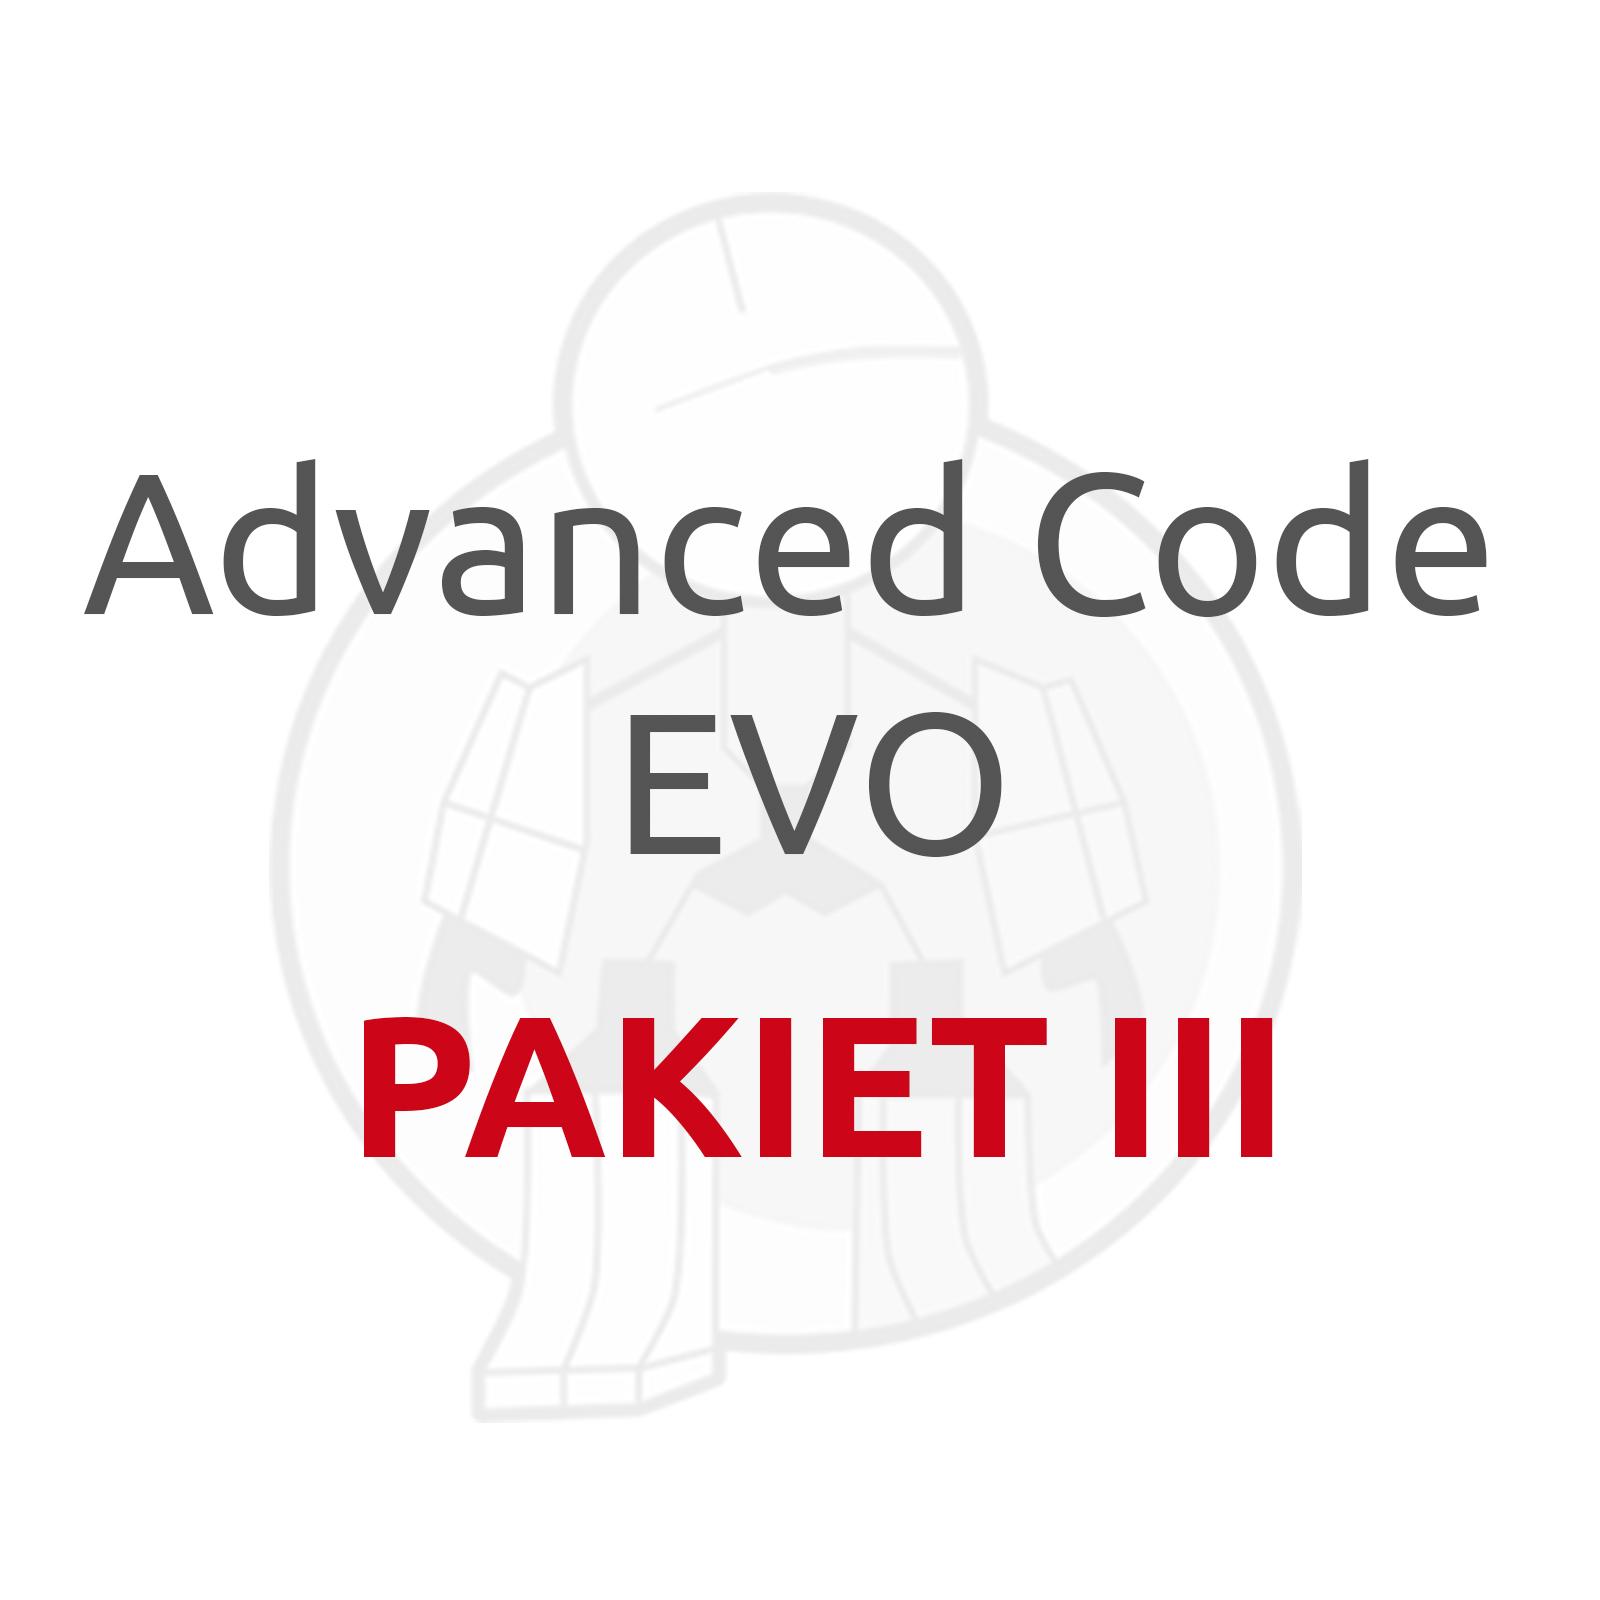 advanced code evo pakiet 3